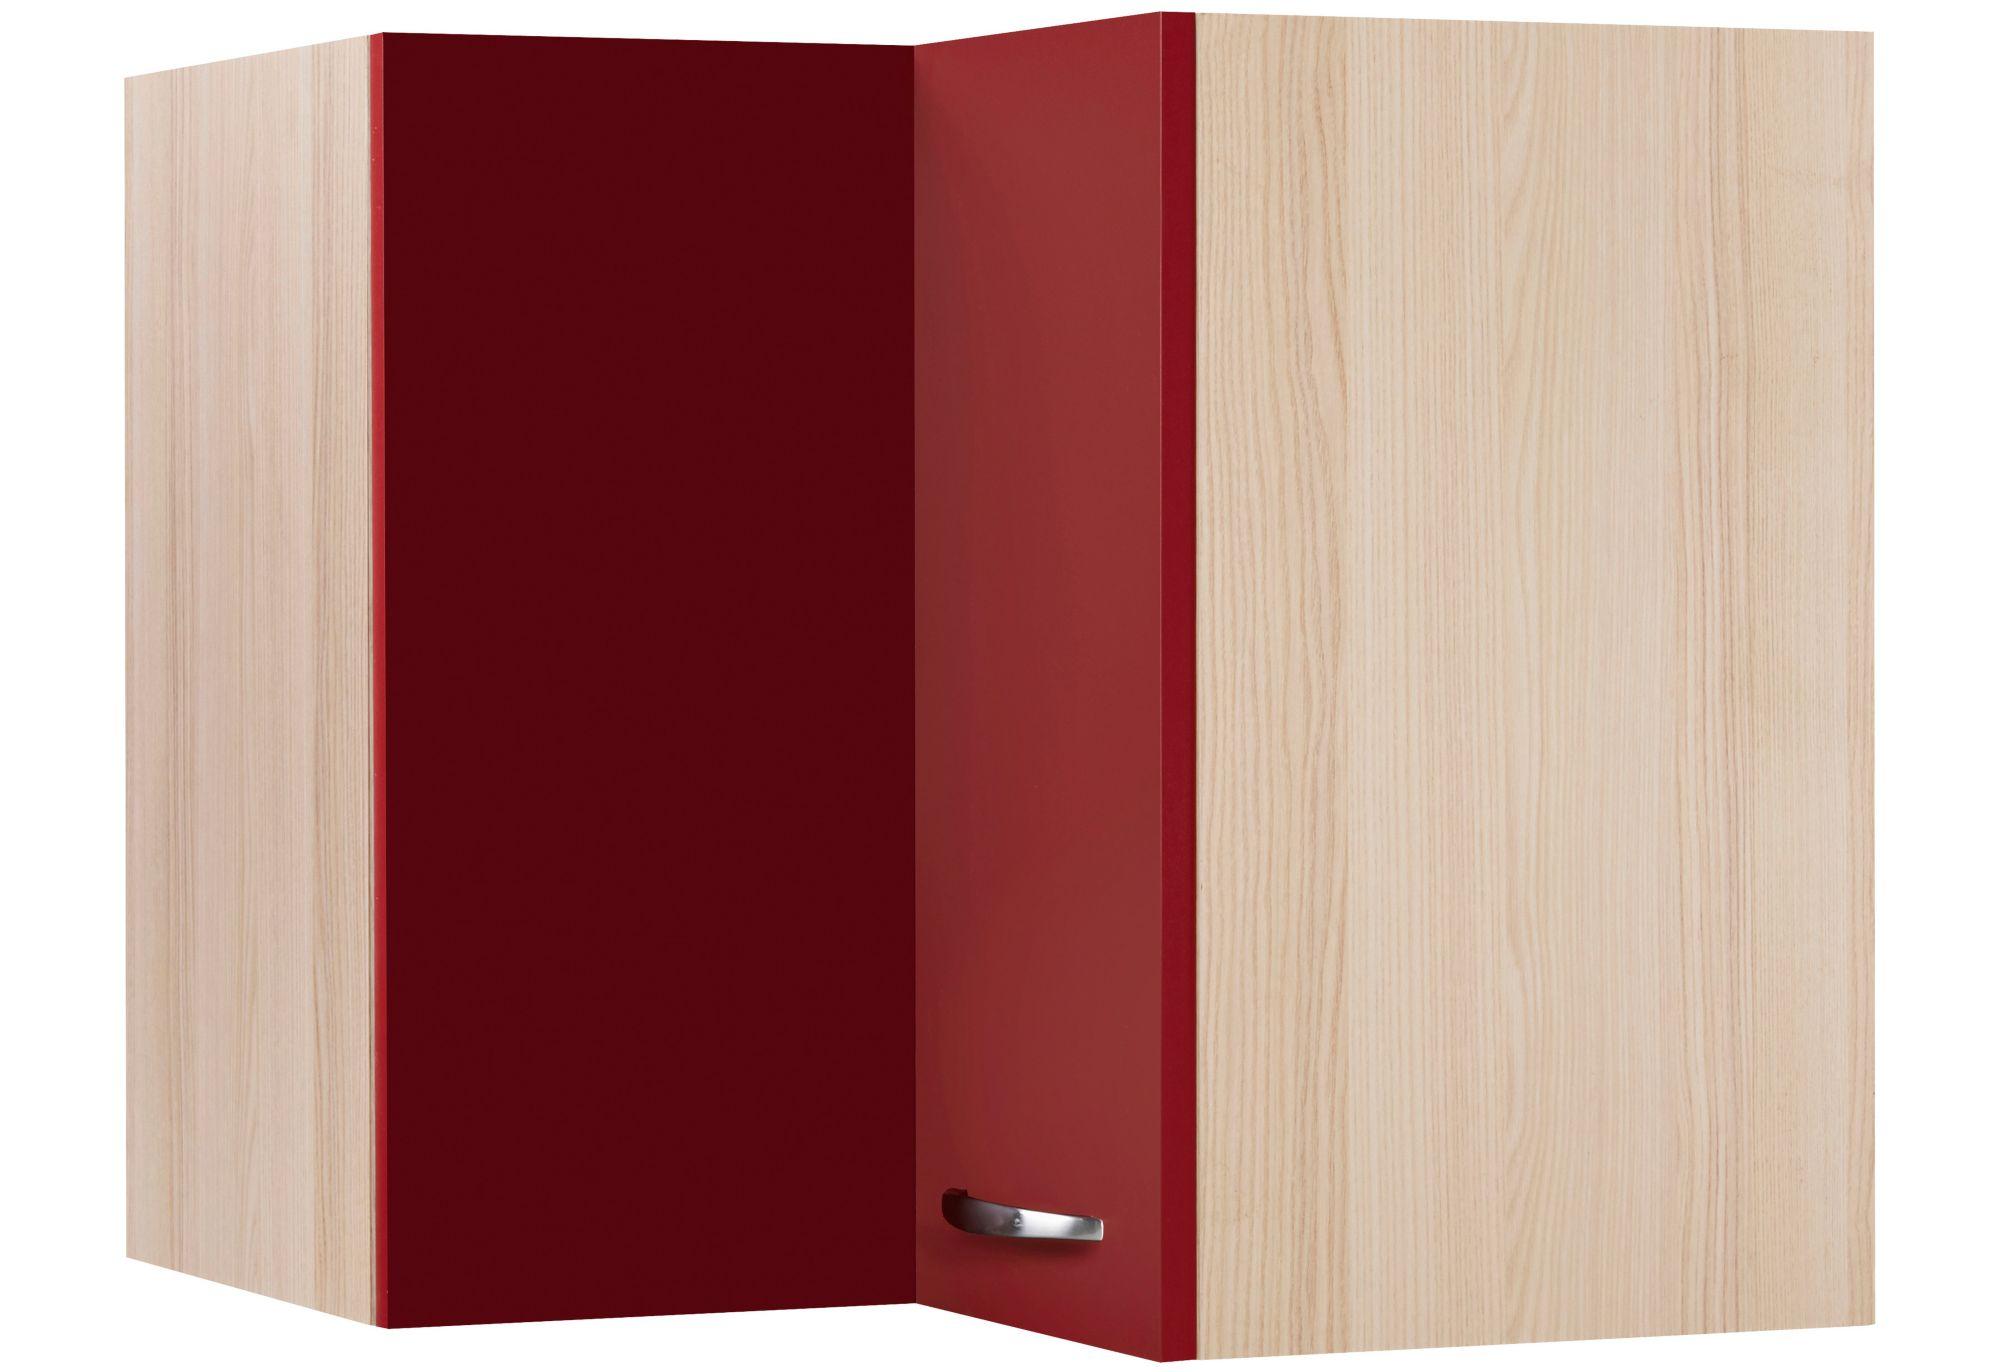 eck h ngeschrank dakota breite 60 x 60 cm schwab. Black Bedroom Furniture Sets. Home Design Ideas